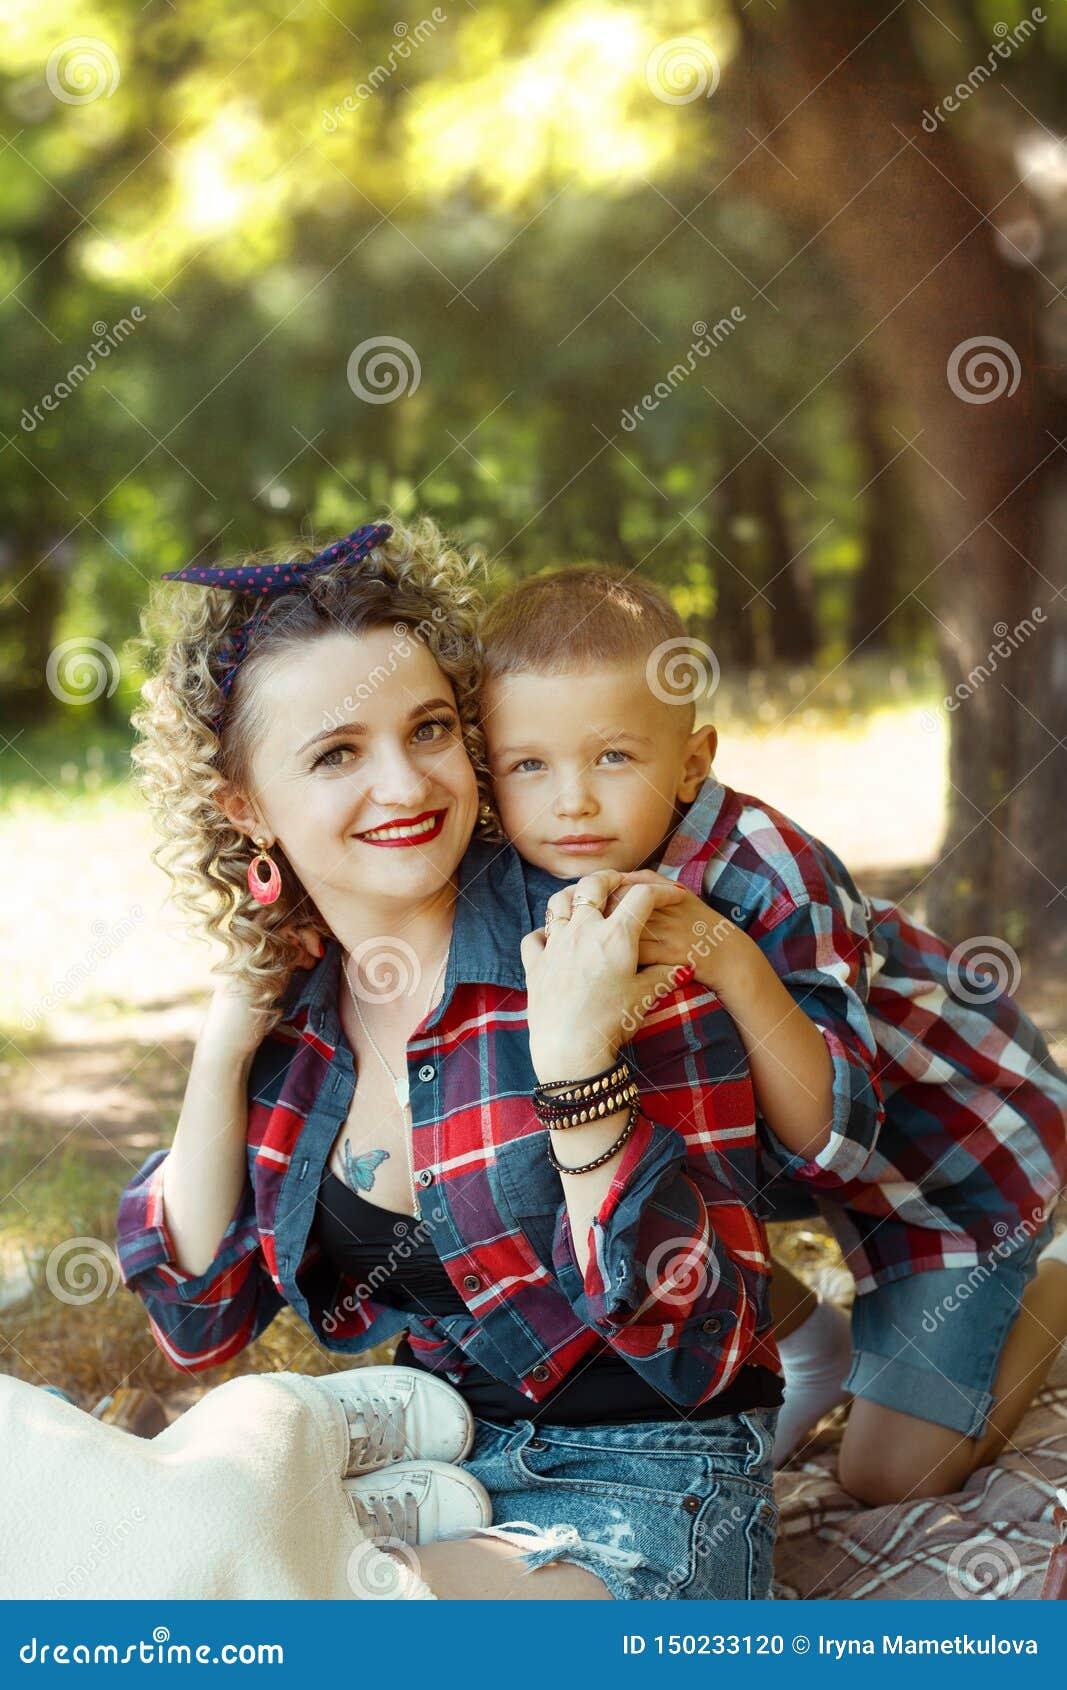 Mother and son lovely portrait together hugging